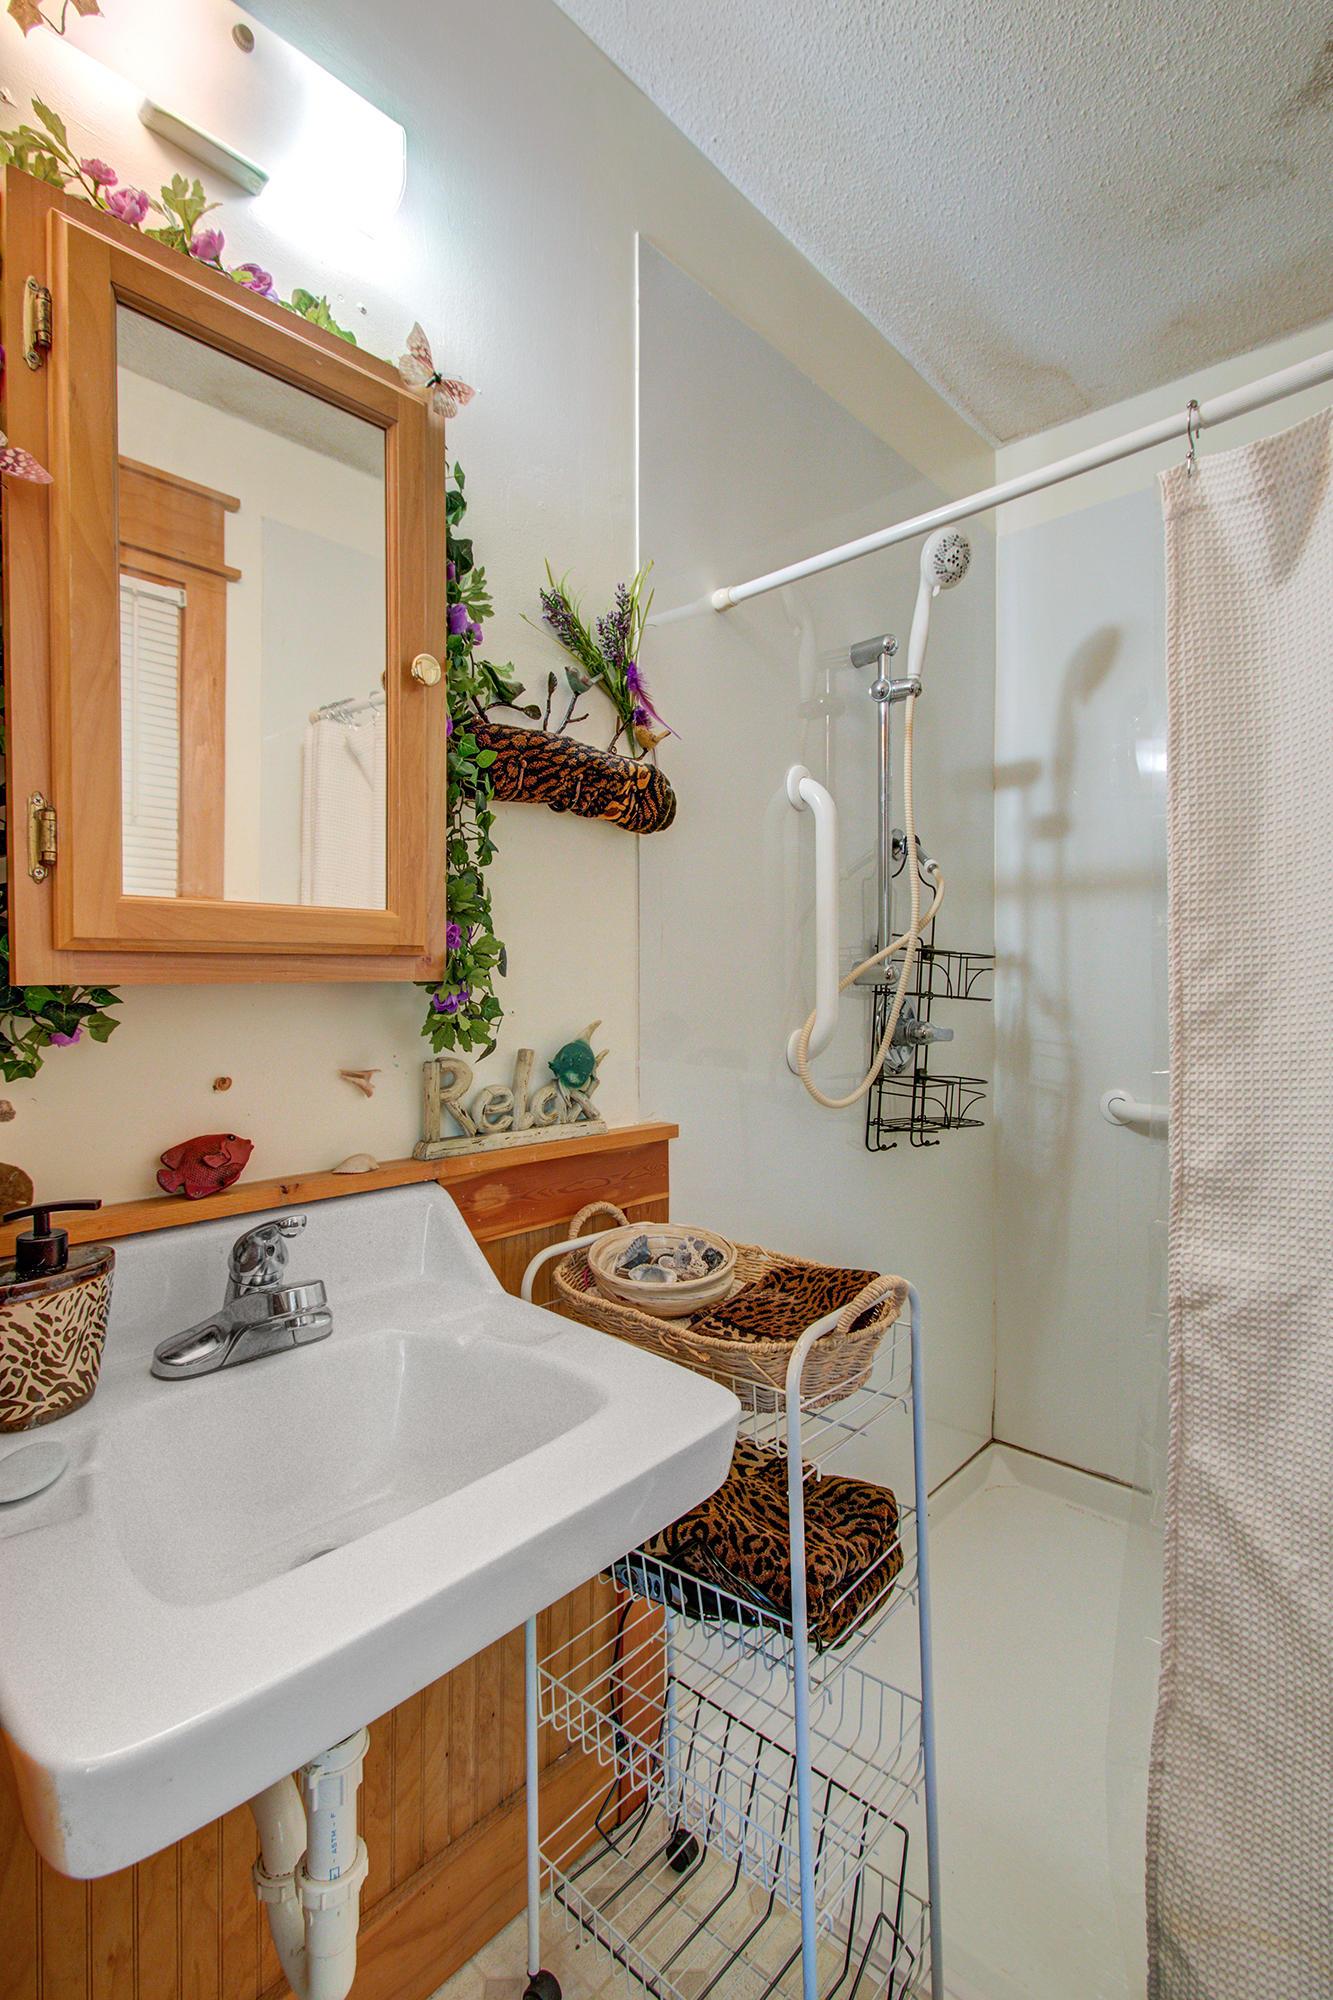 Wando Lakes Homes For Sale - 858 Fairlawn, Mount Pleasant, SC - 18